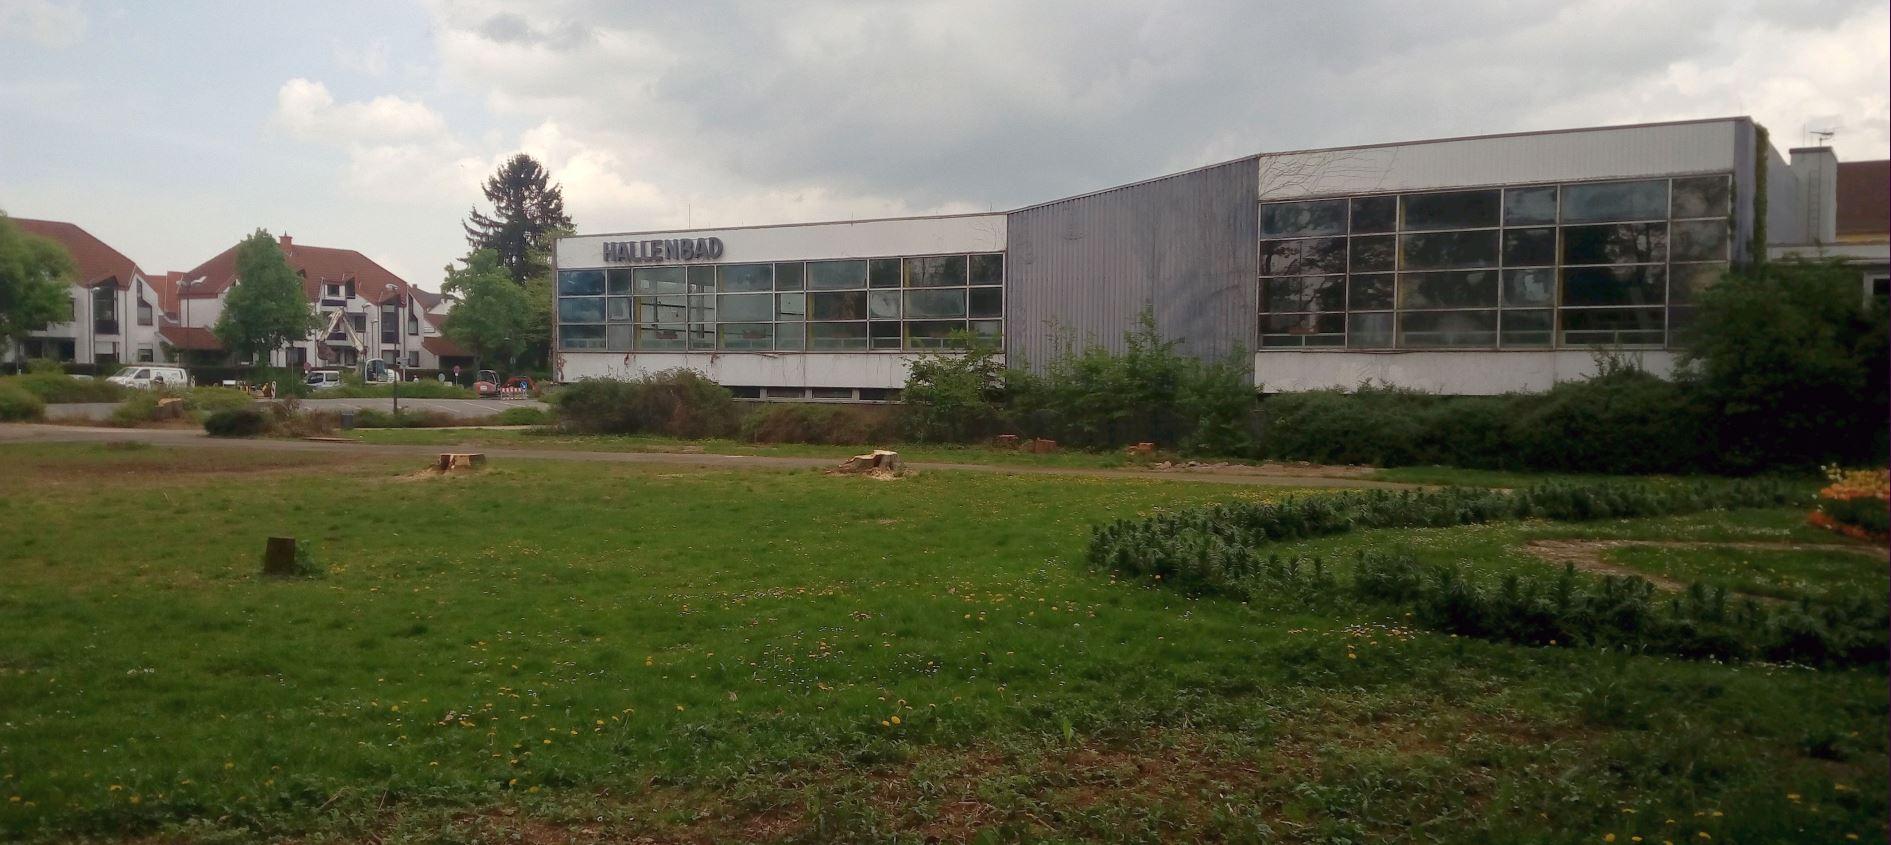 Hallenbad im April 2018